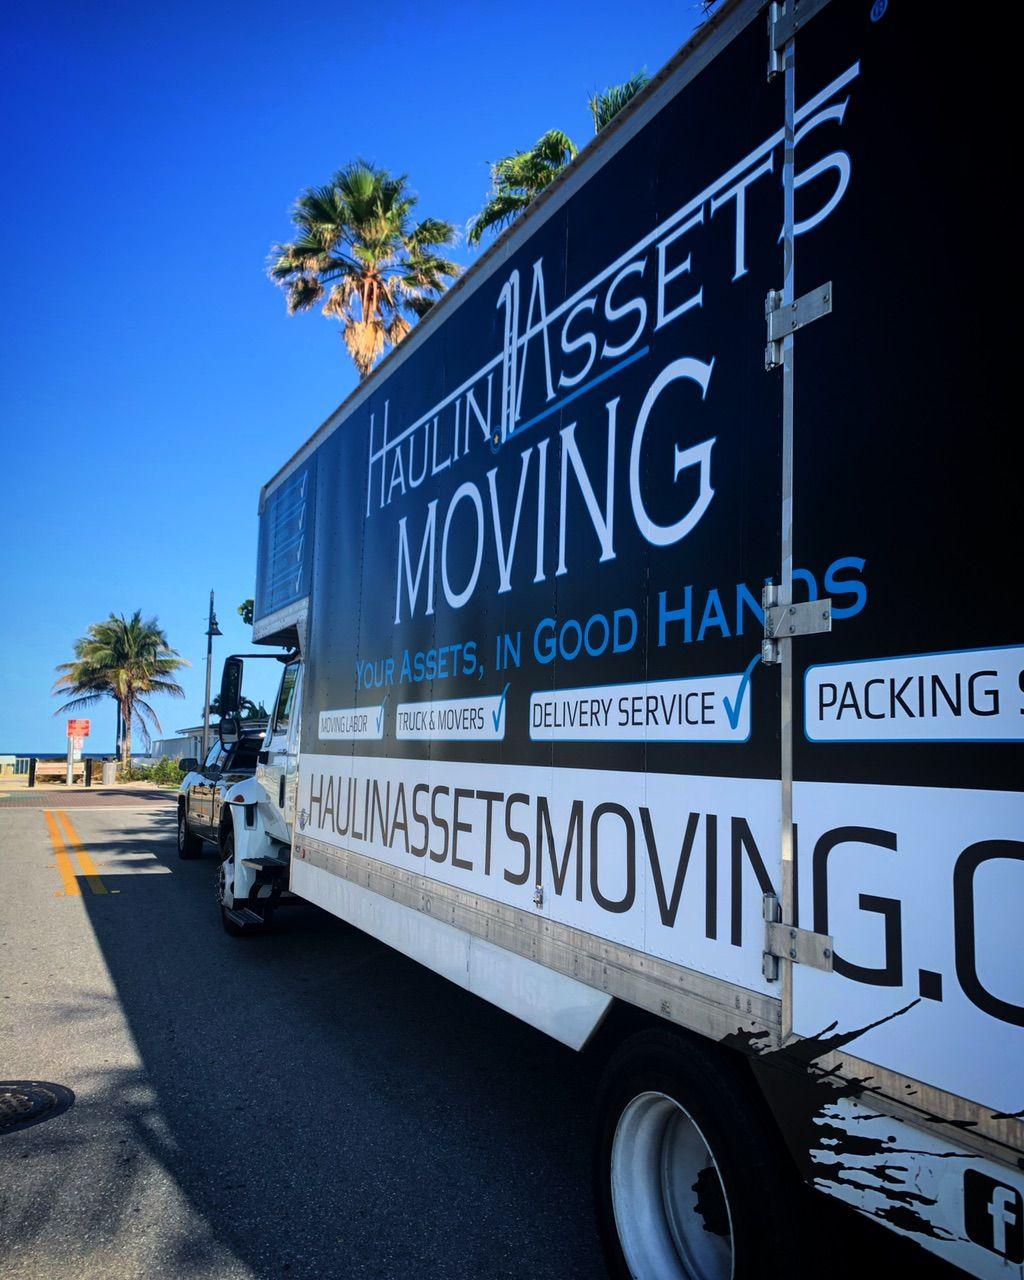 Haulin Assets Moving